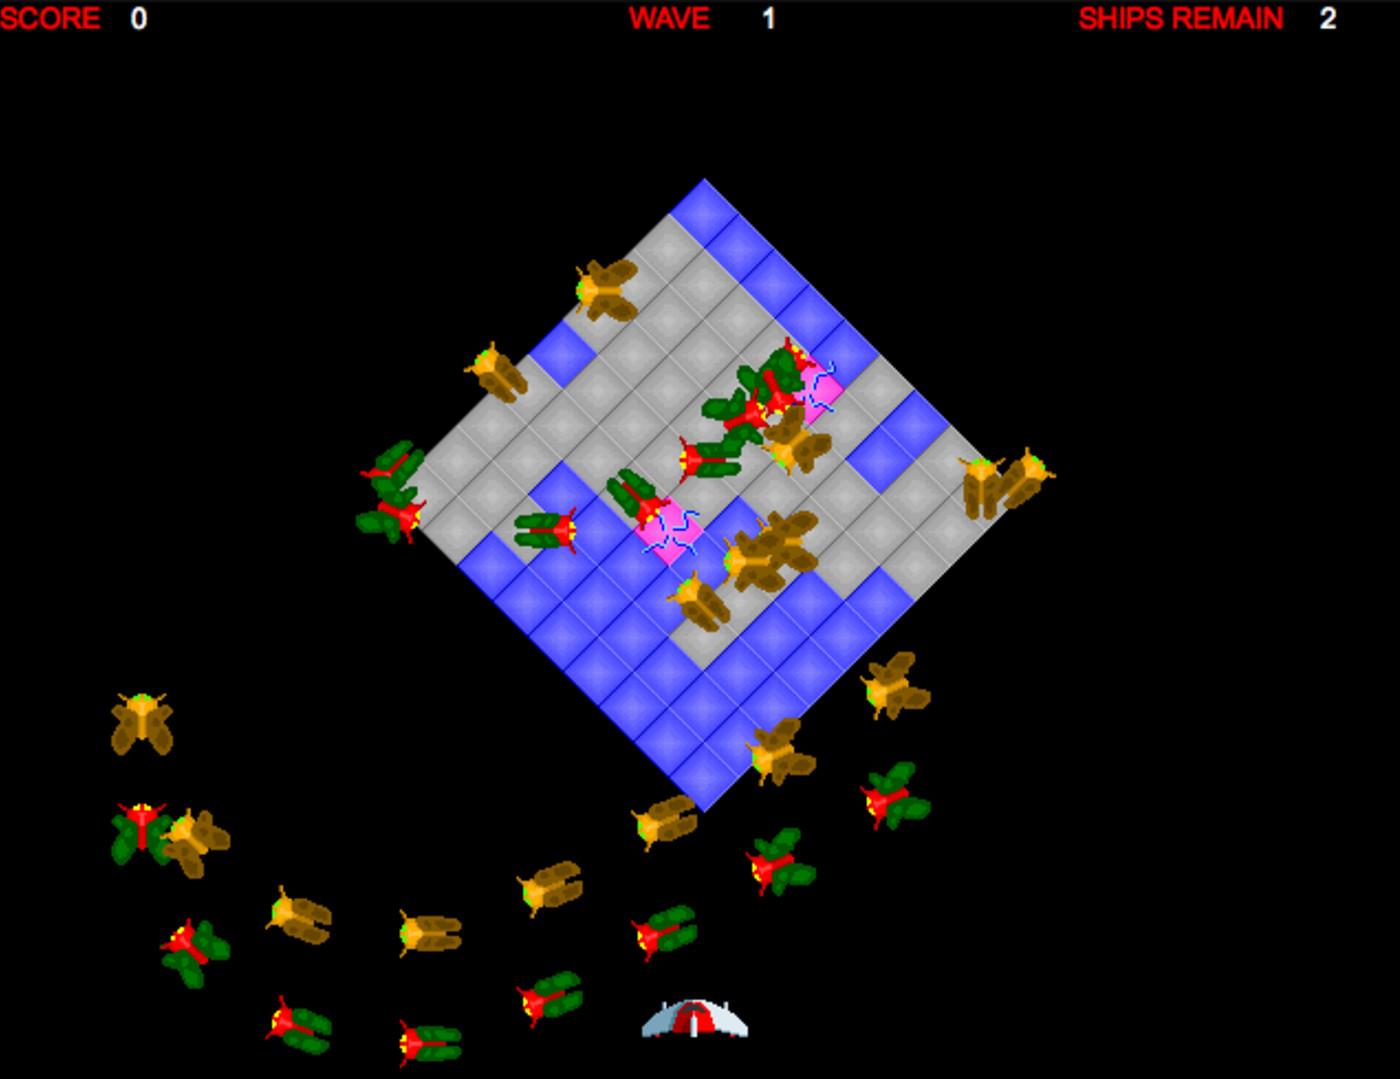 Screenshot of Swarm arcade game